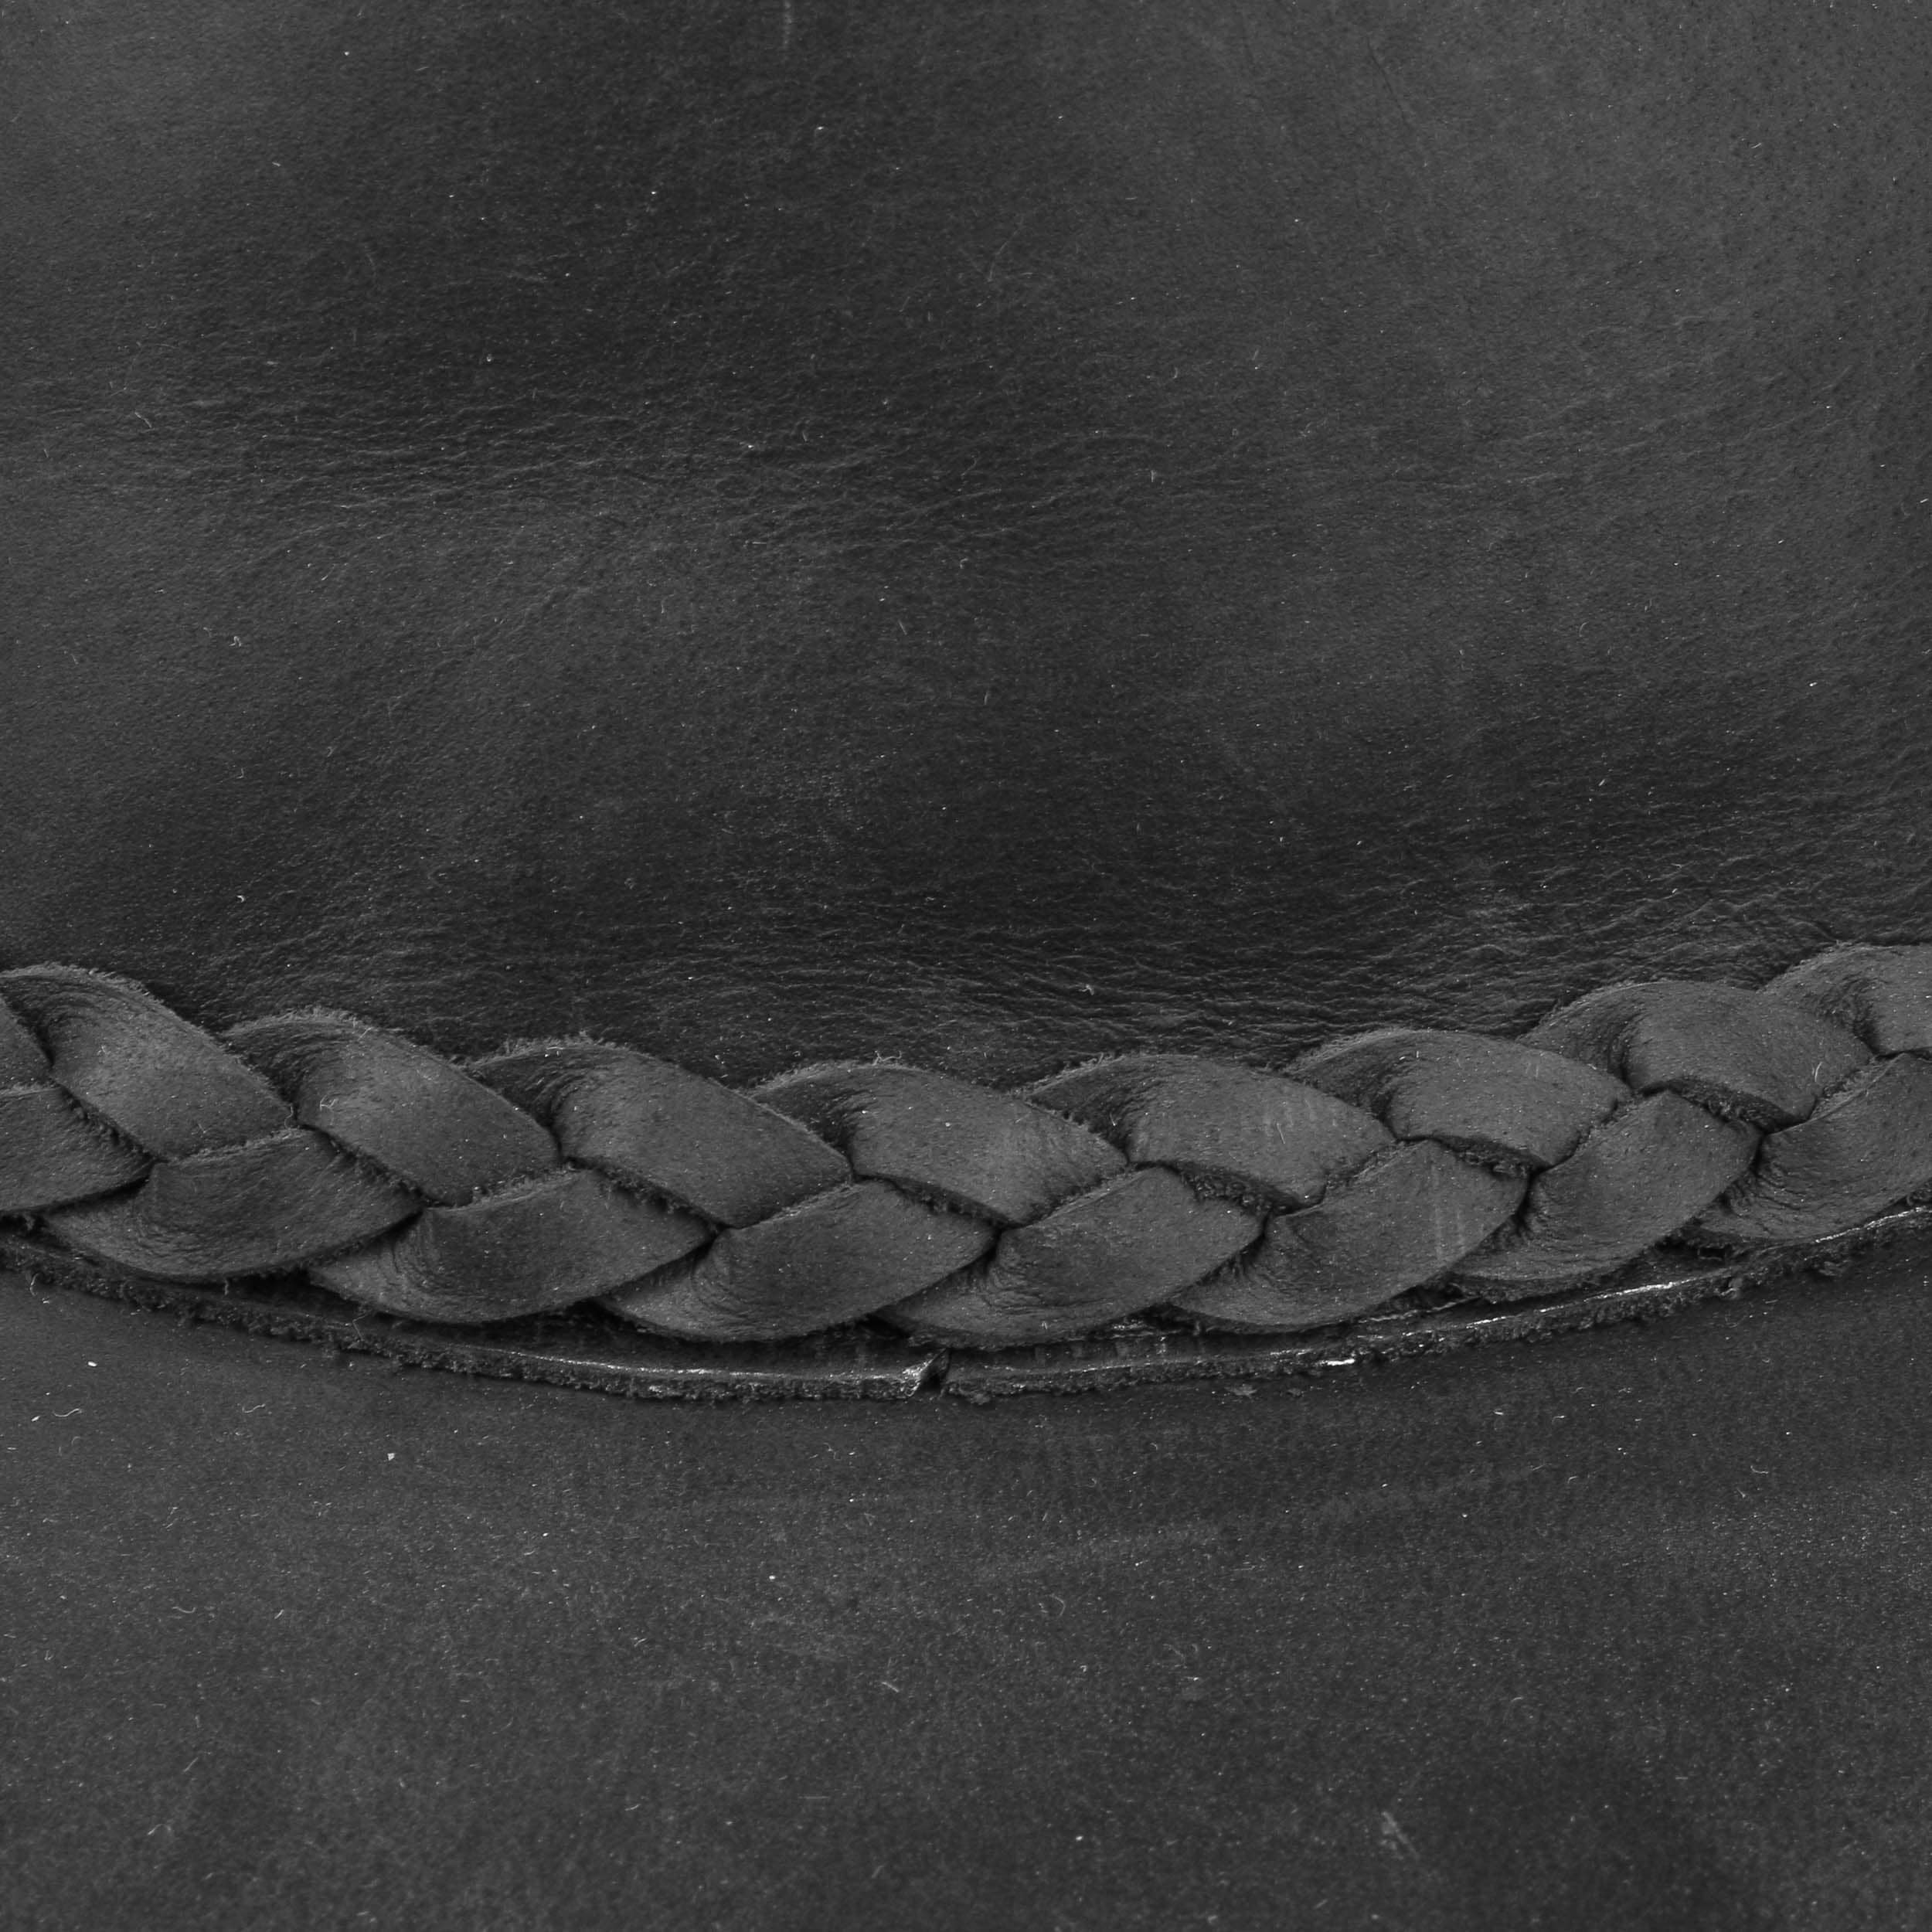 1ff4c1f35b6b2 ... Sombrero Western Buffalo Leather by Stetson - marrón oscuro 4 ...